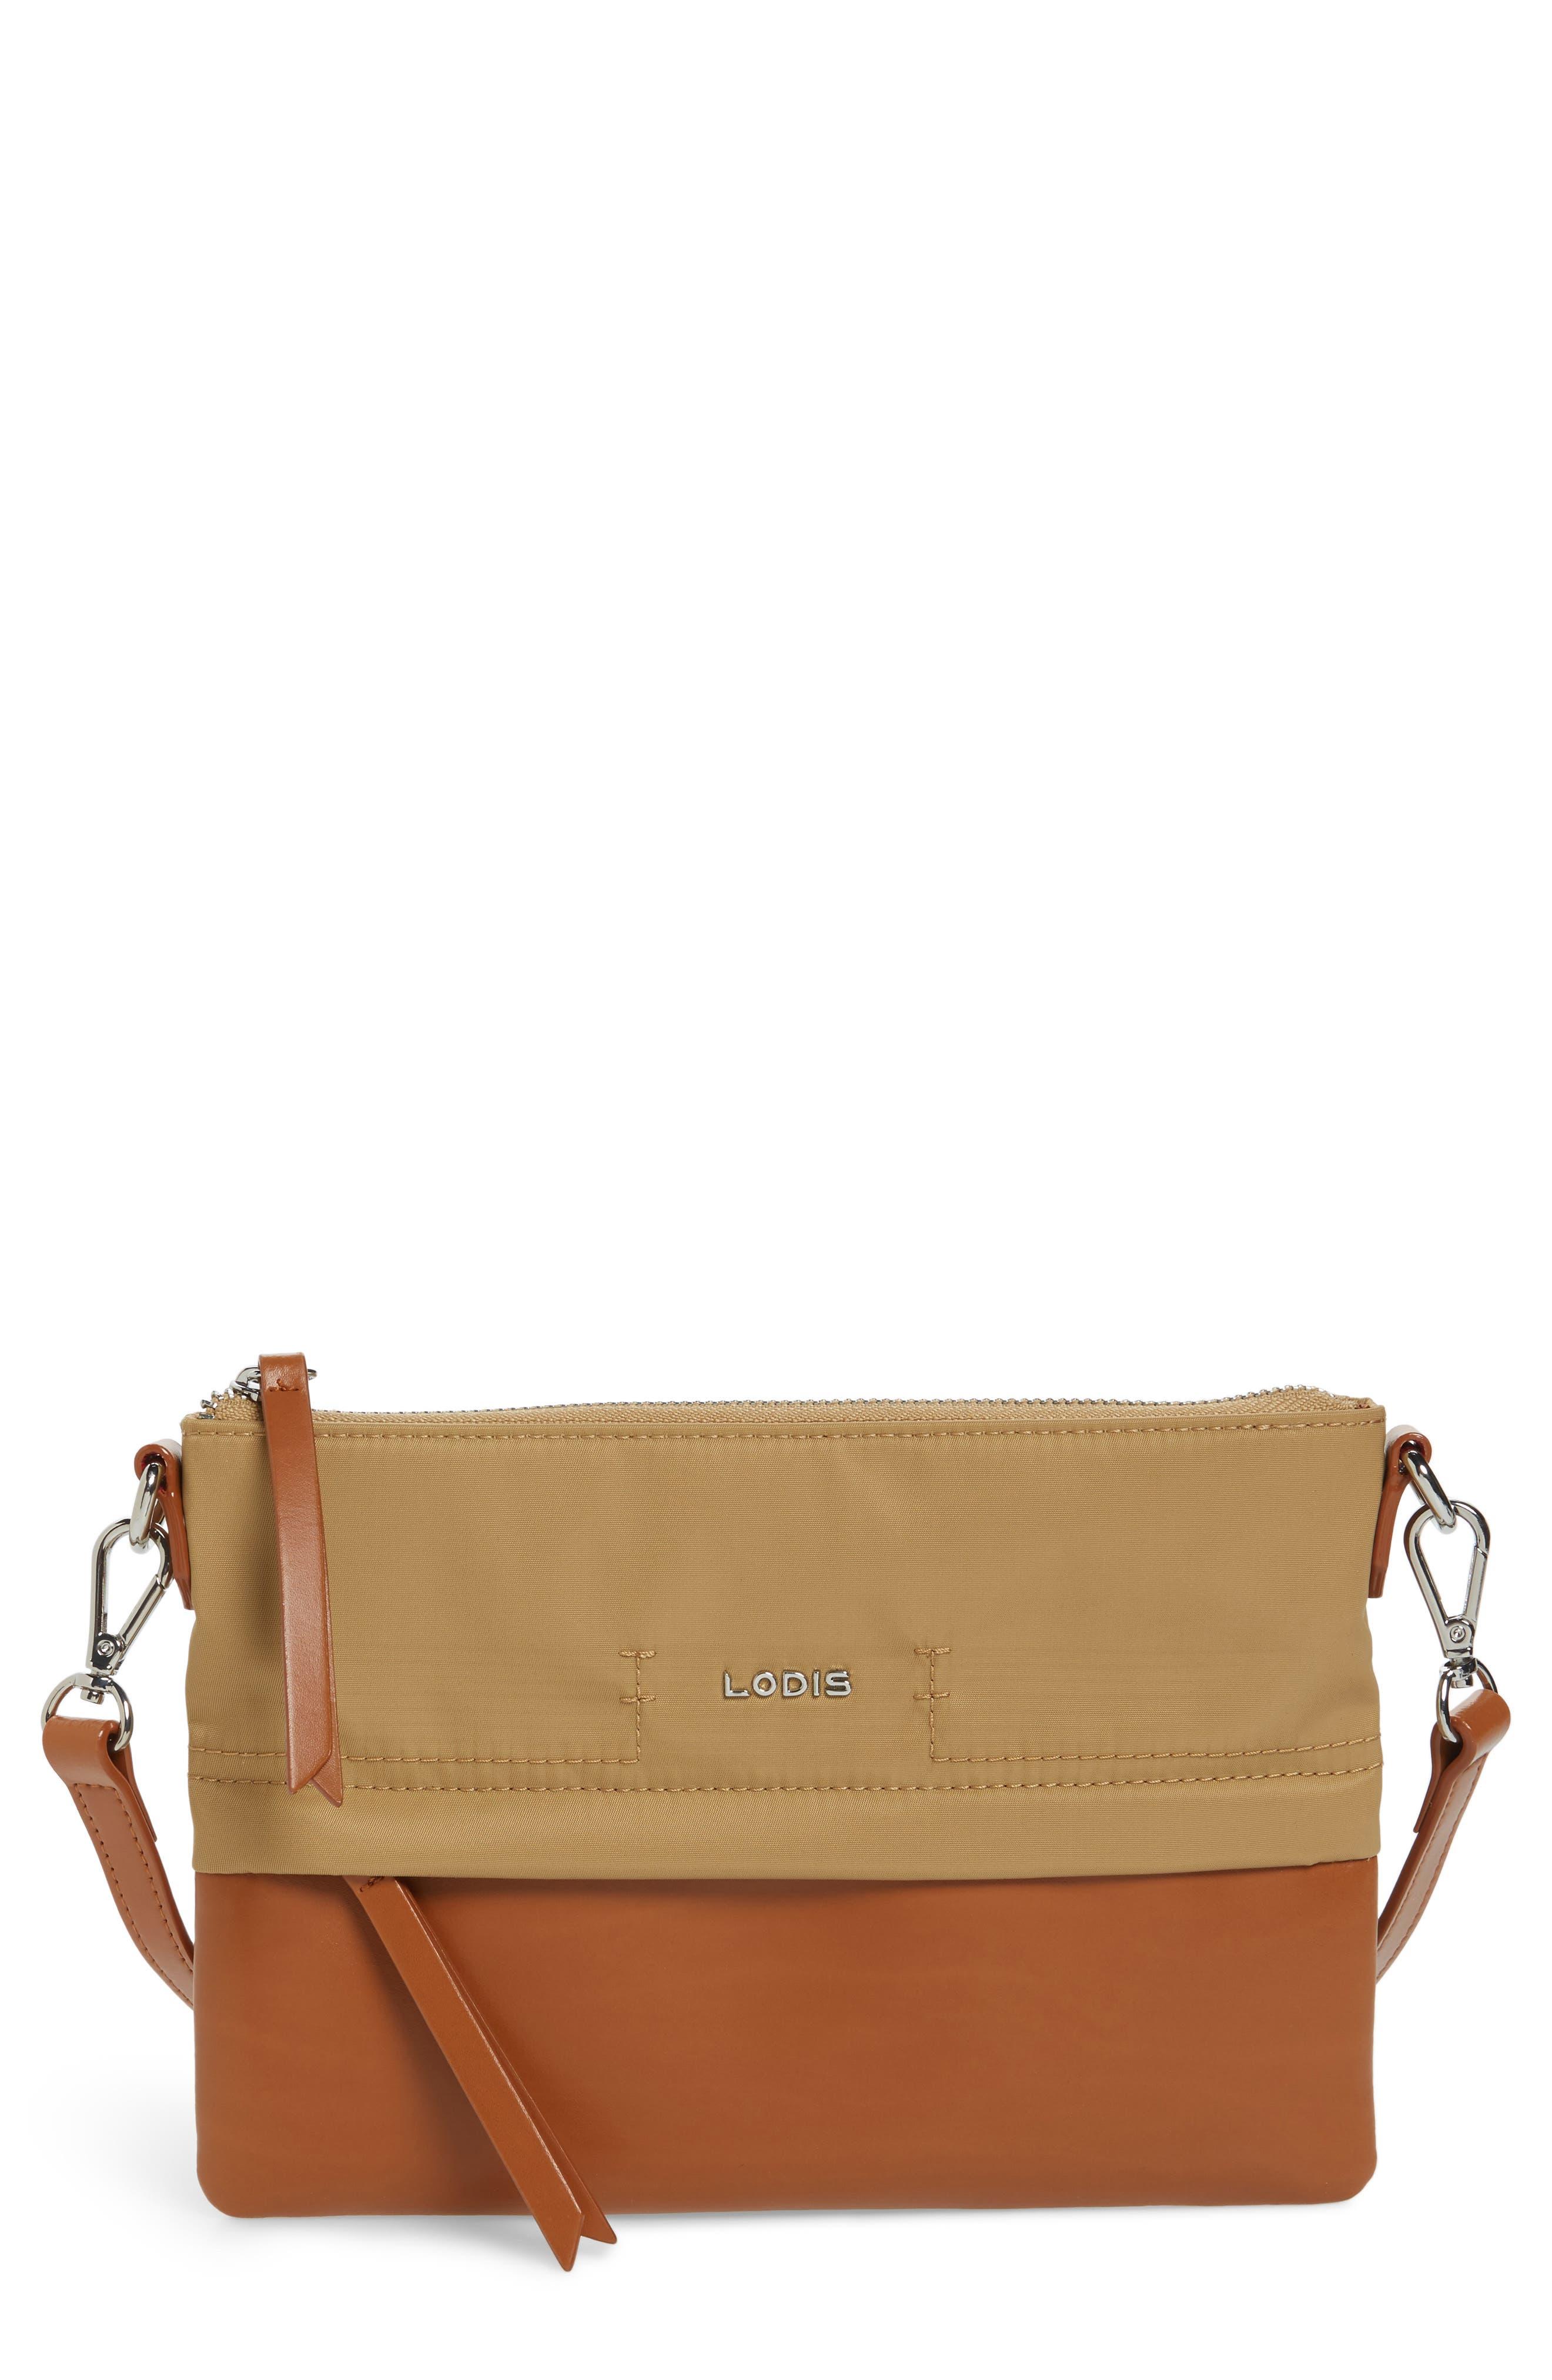 Alternate Image 1 Selected - LODIS Los Angeles Kate Under Lock & Key Kala Leather Convertible Crossbody Bag